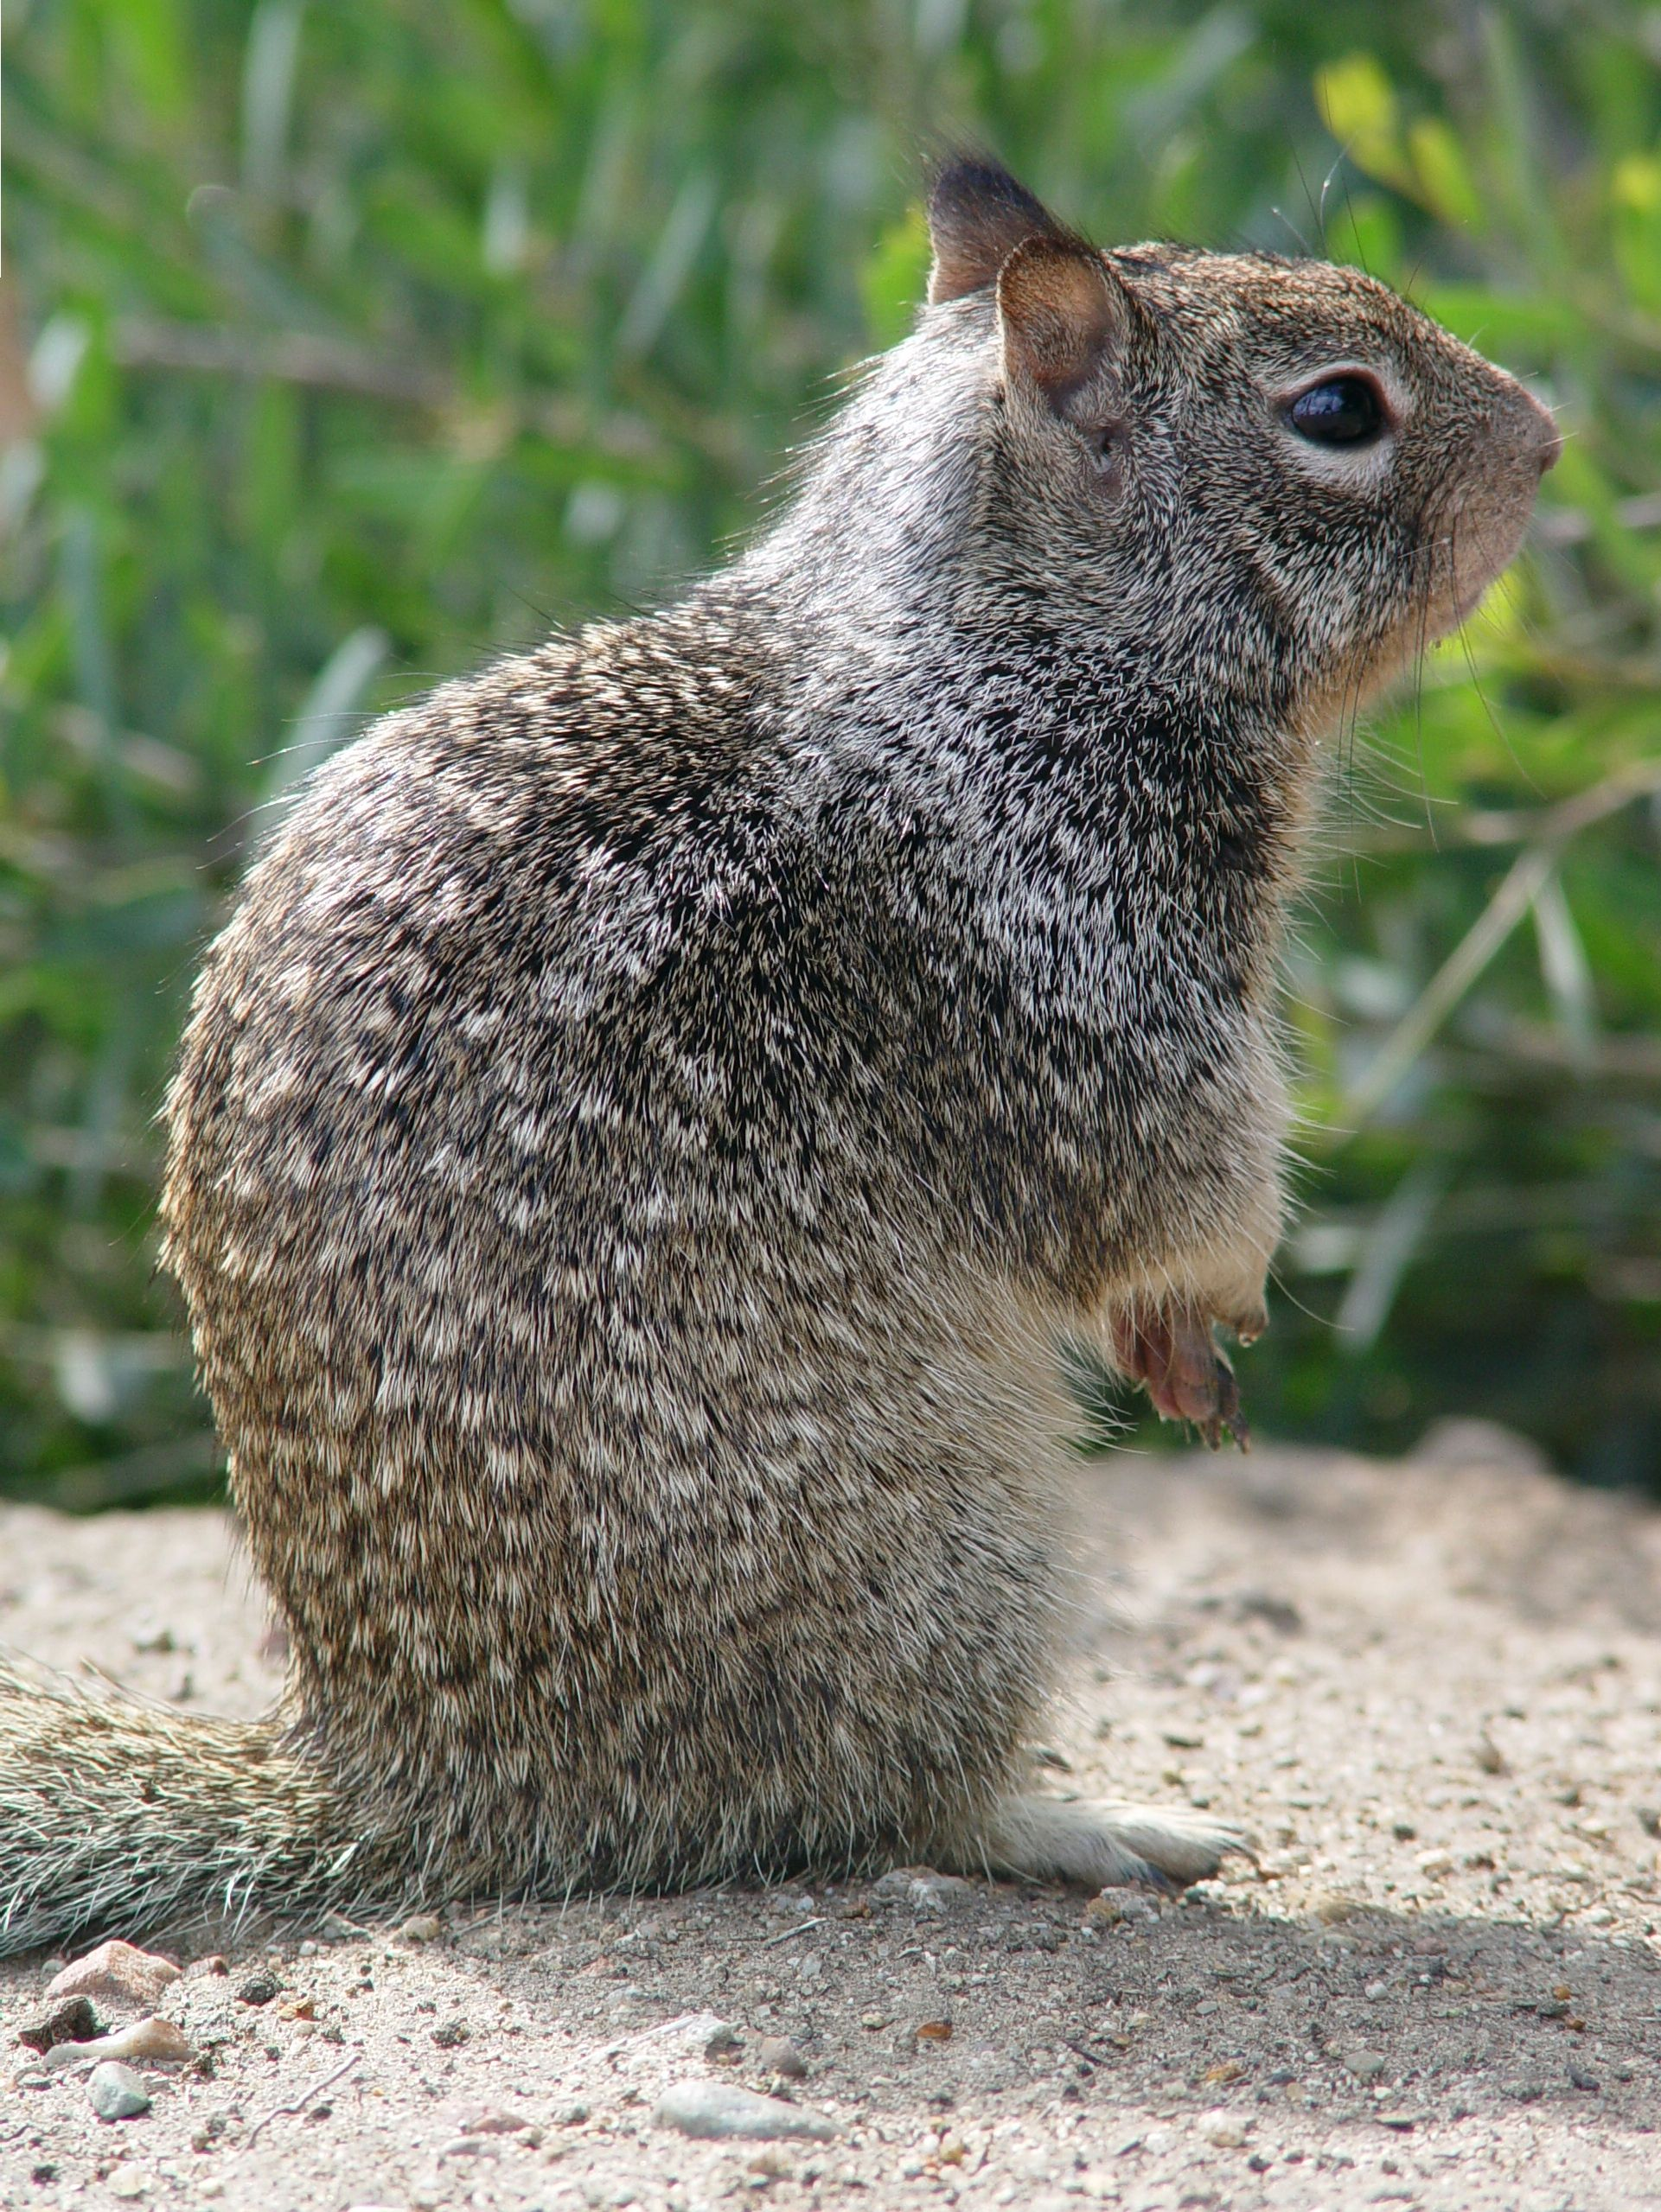 California ground squirrel ground squirrel squirrel